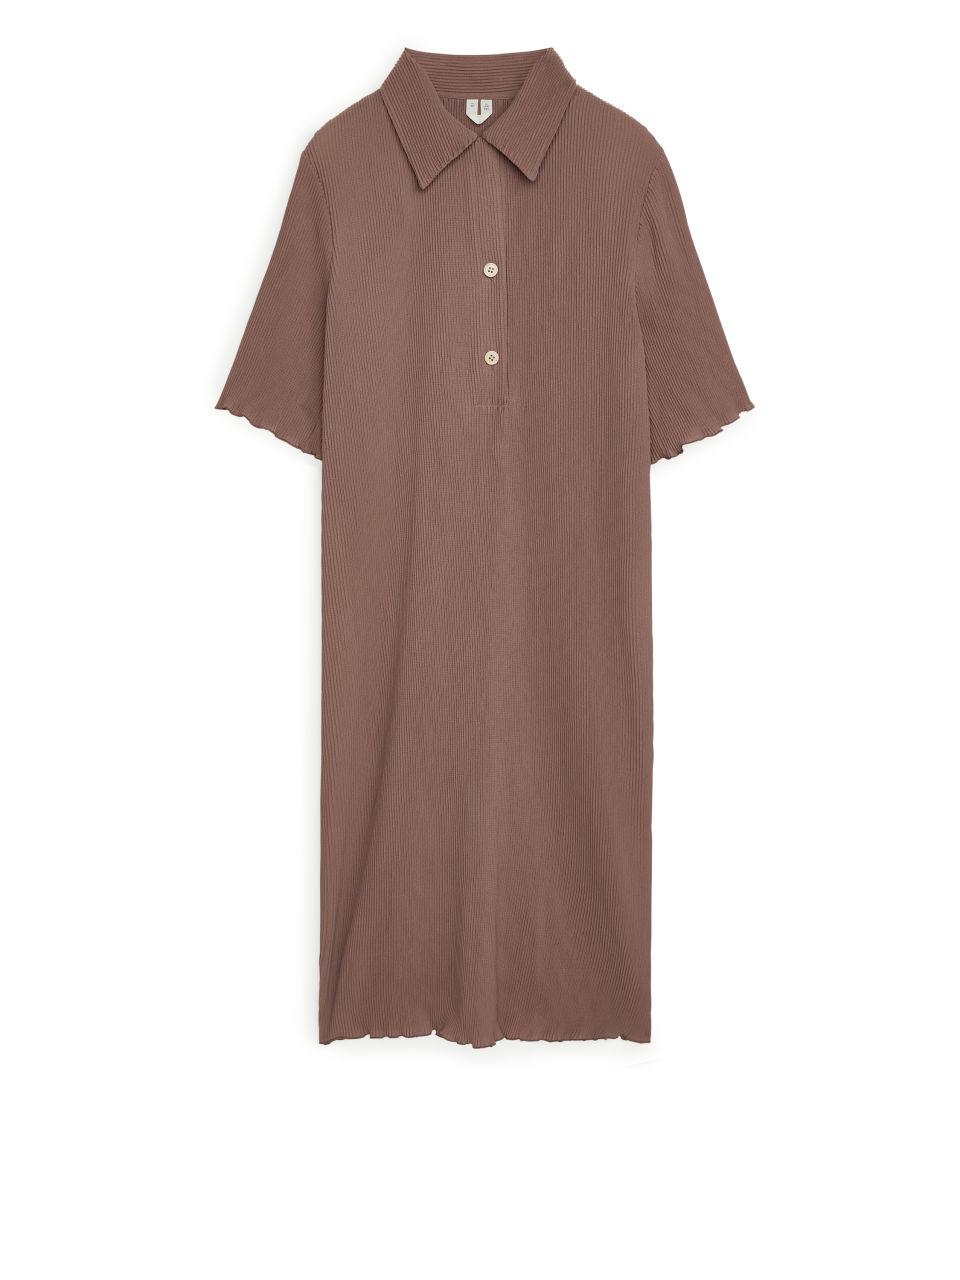 Pleated Short Sleeve Dress - Beige